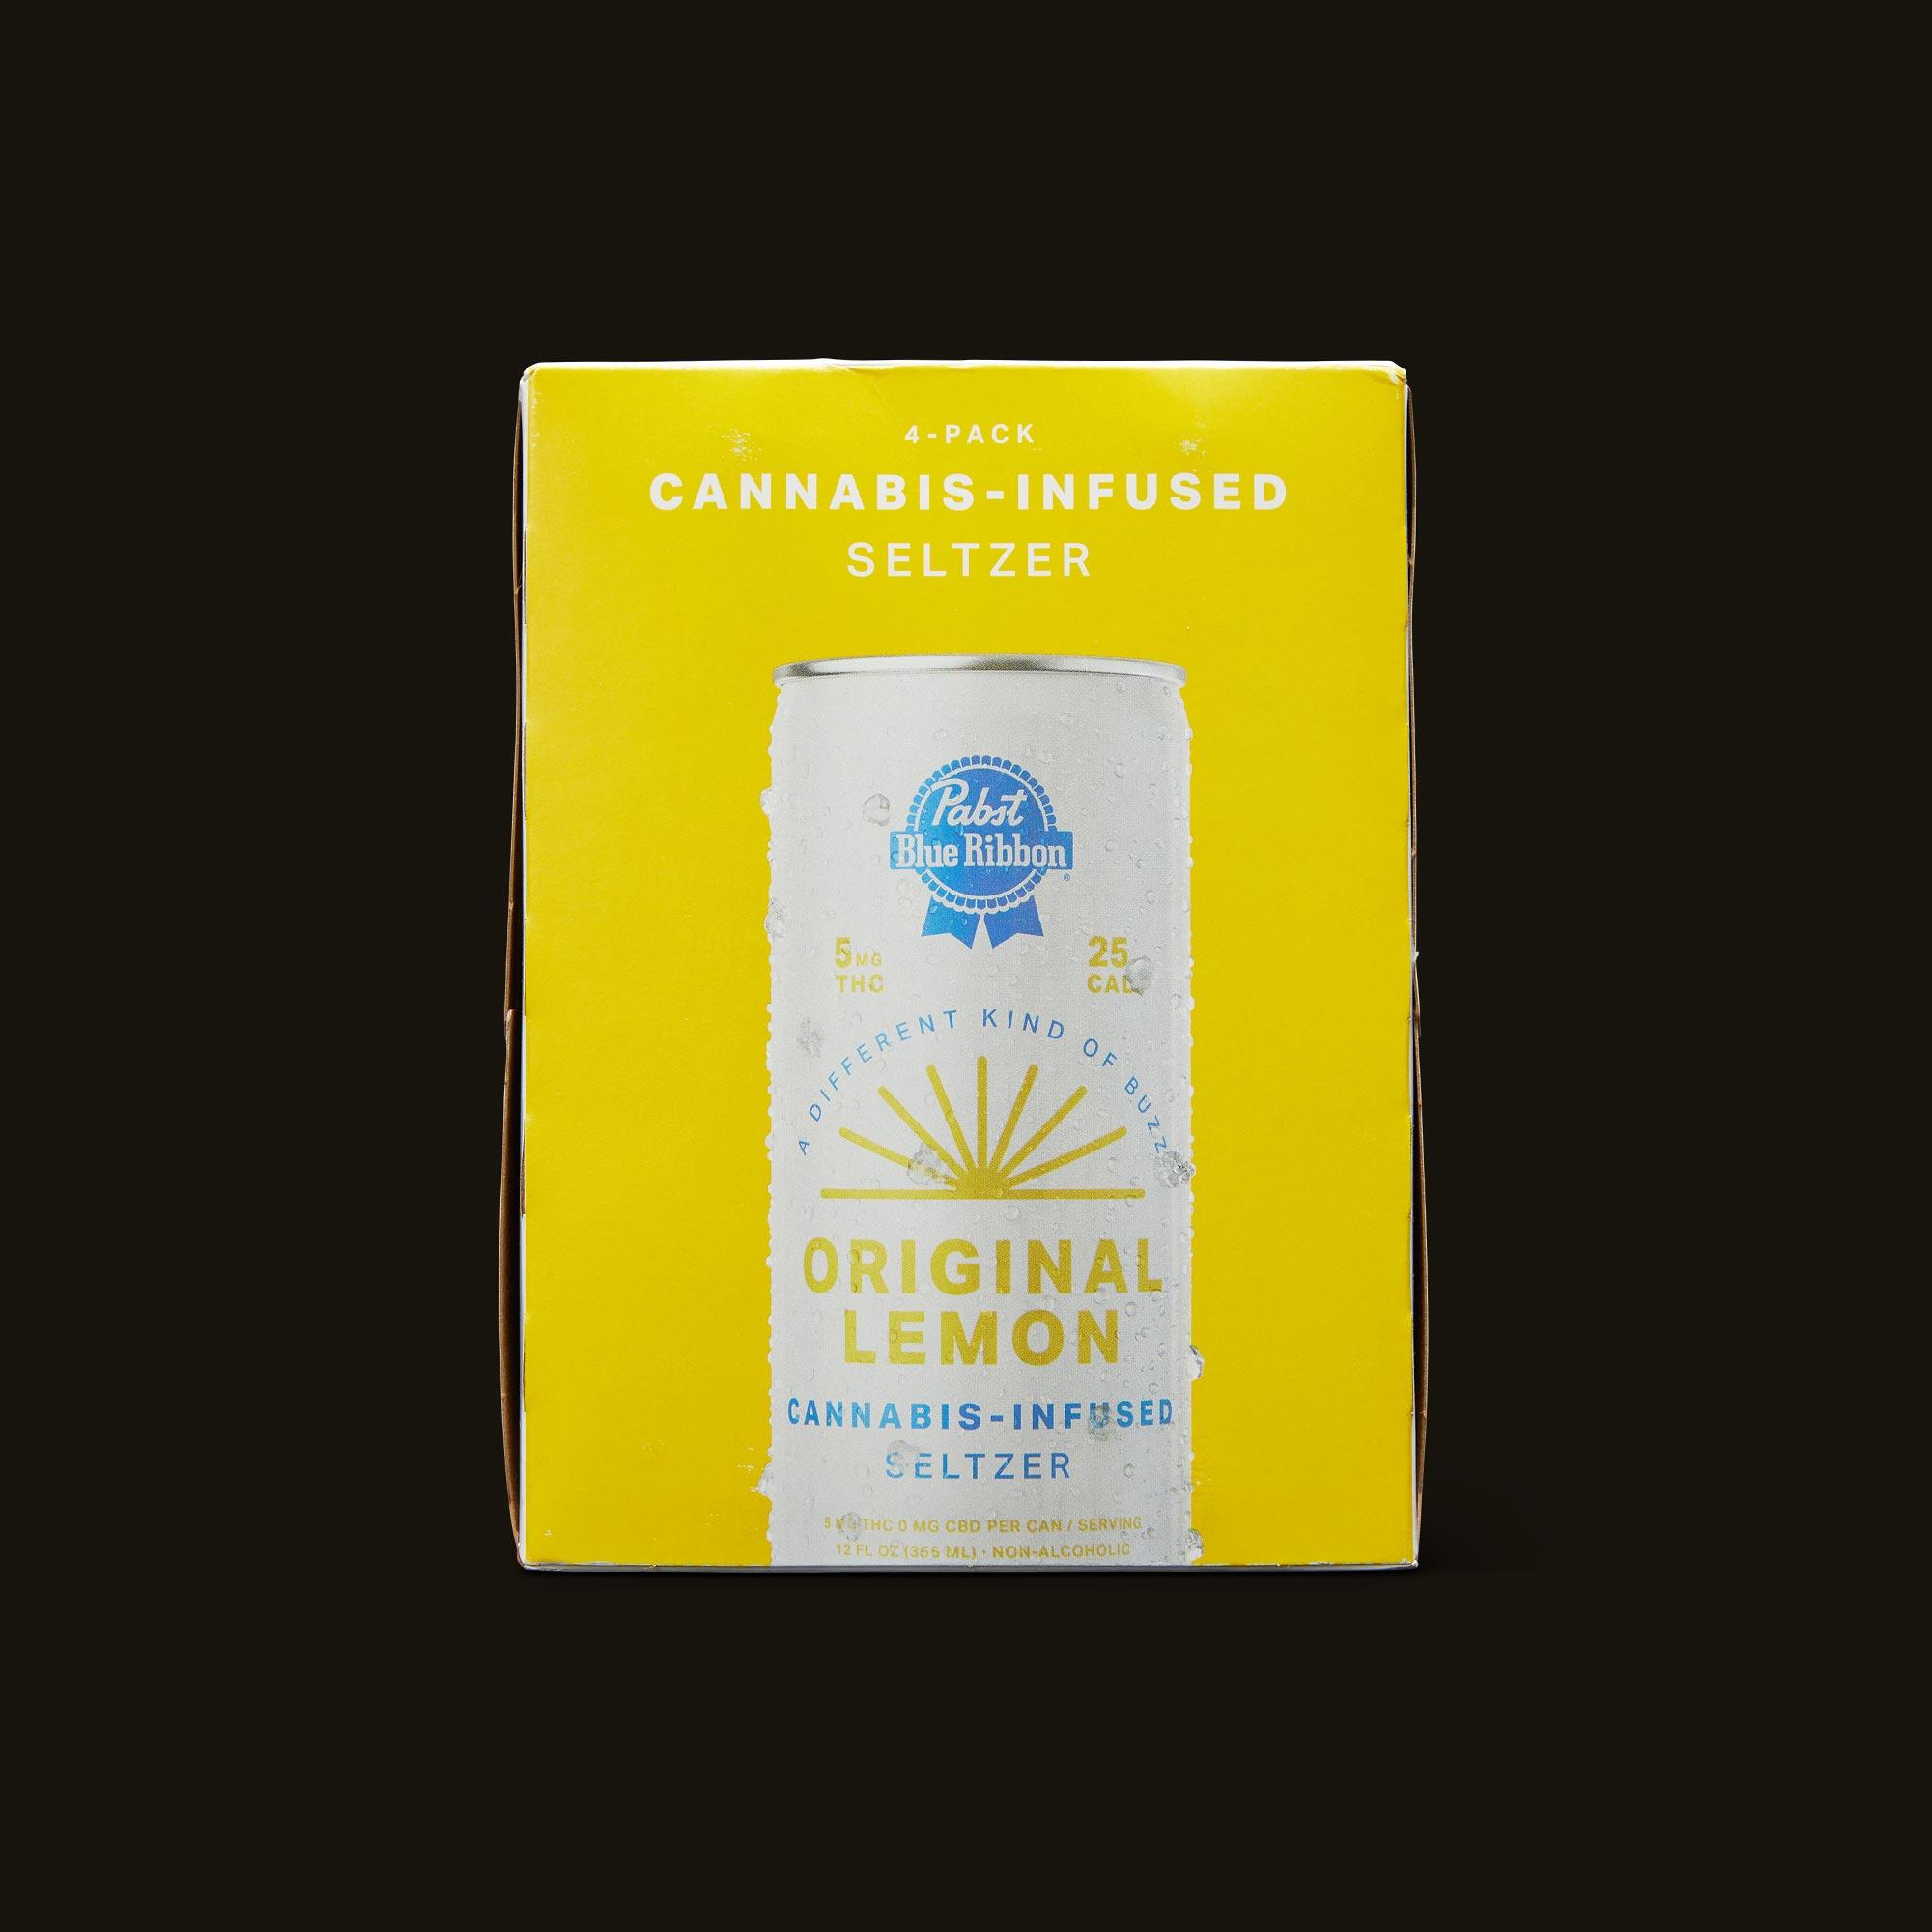 Pabst Blue Ribbon Original Lemon Seltzer